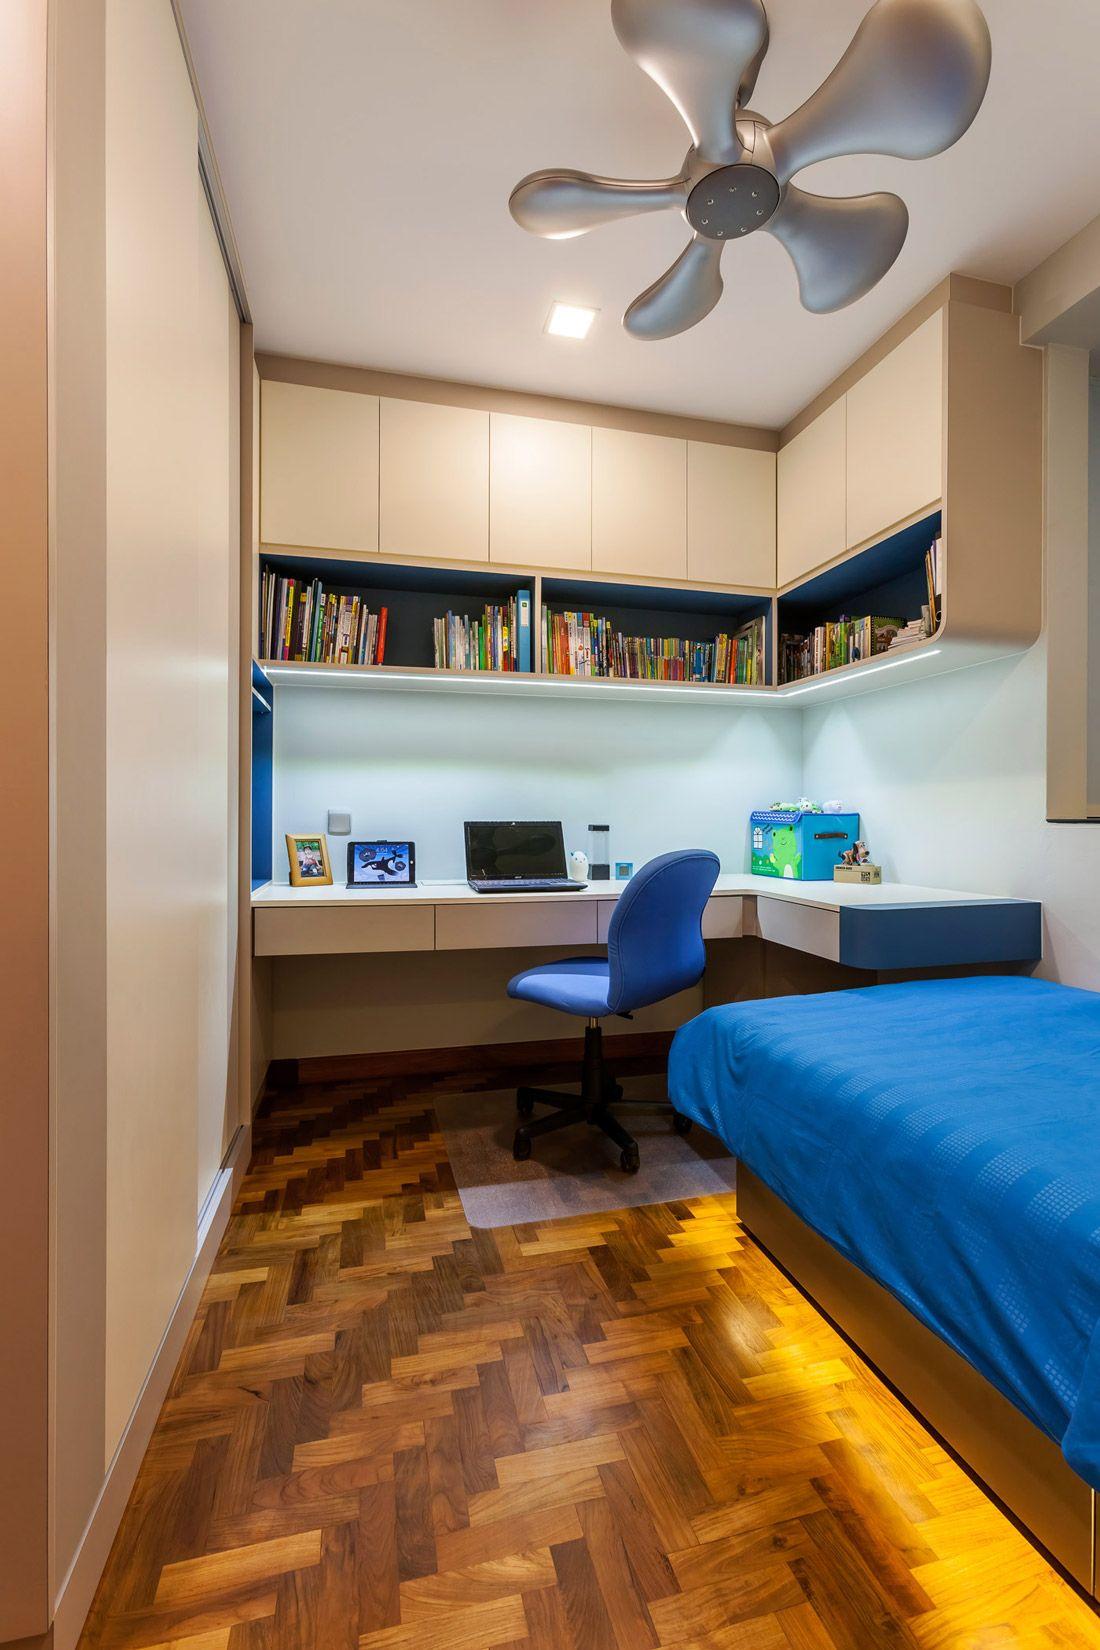 Spring Bloom Serangoon Ave 3 Modern Condominium Interior Design